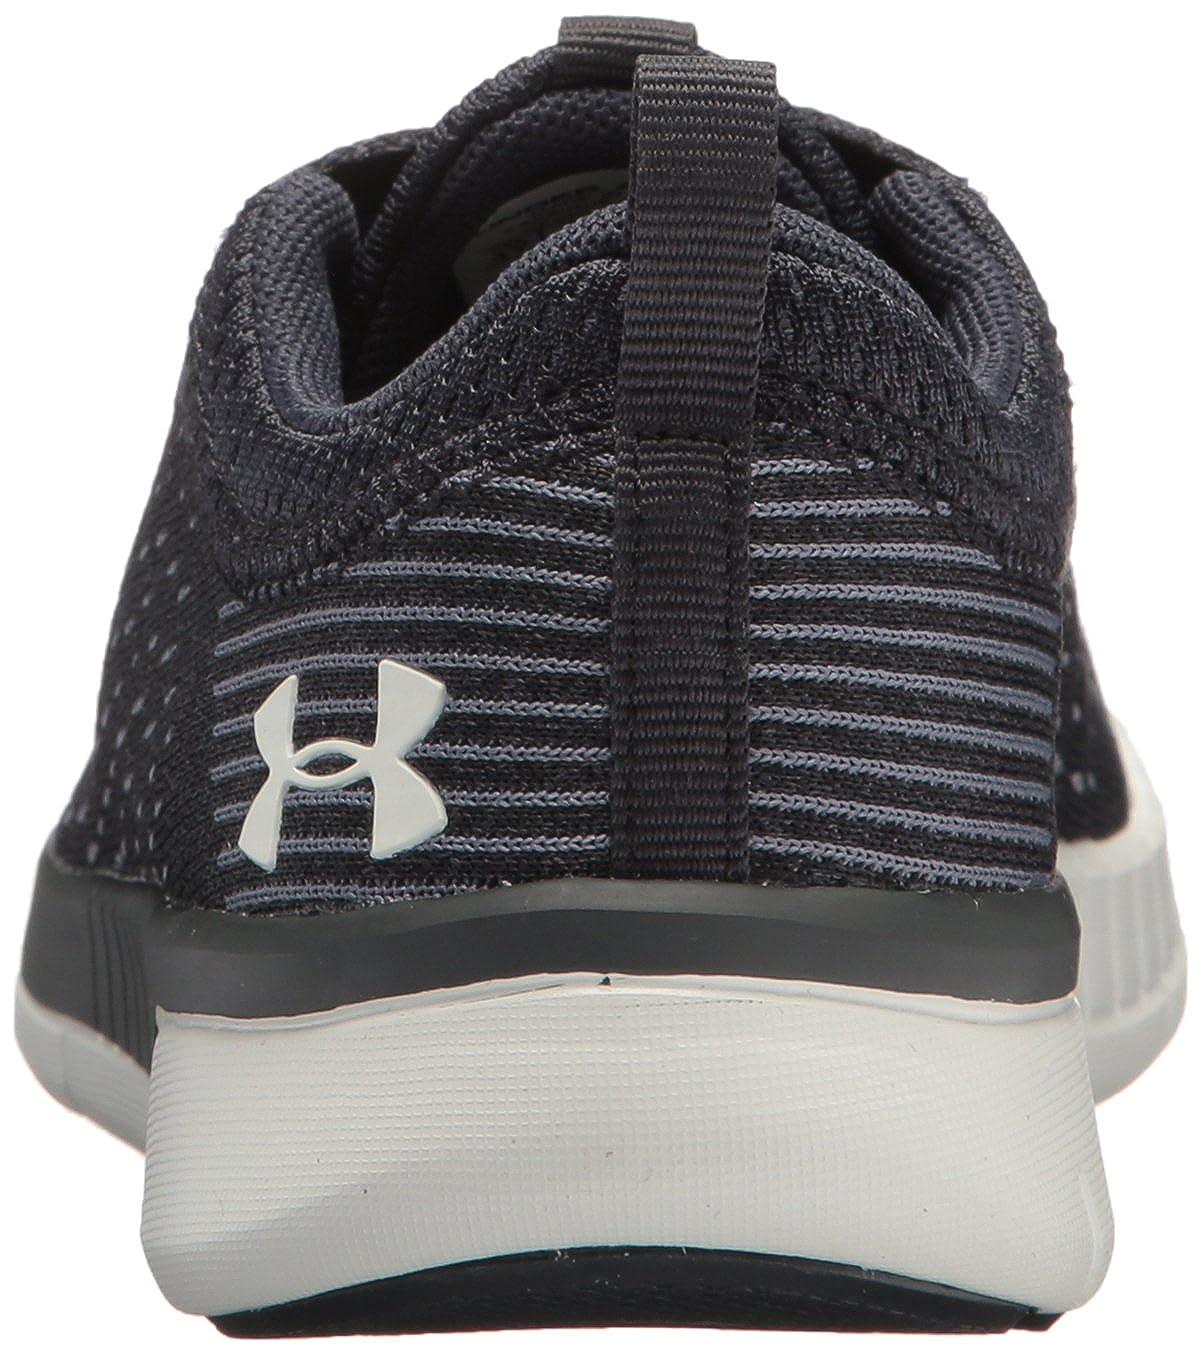 Under Armour Kids Girls Grade School Lightning 2 Sneaker 3020072